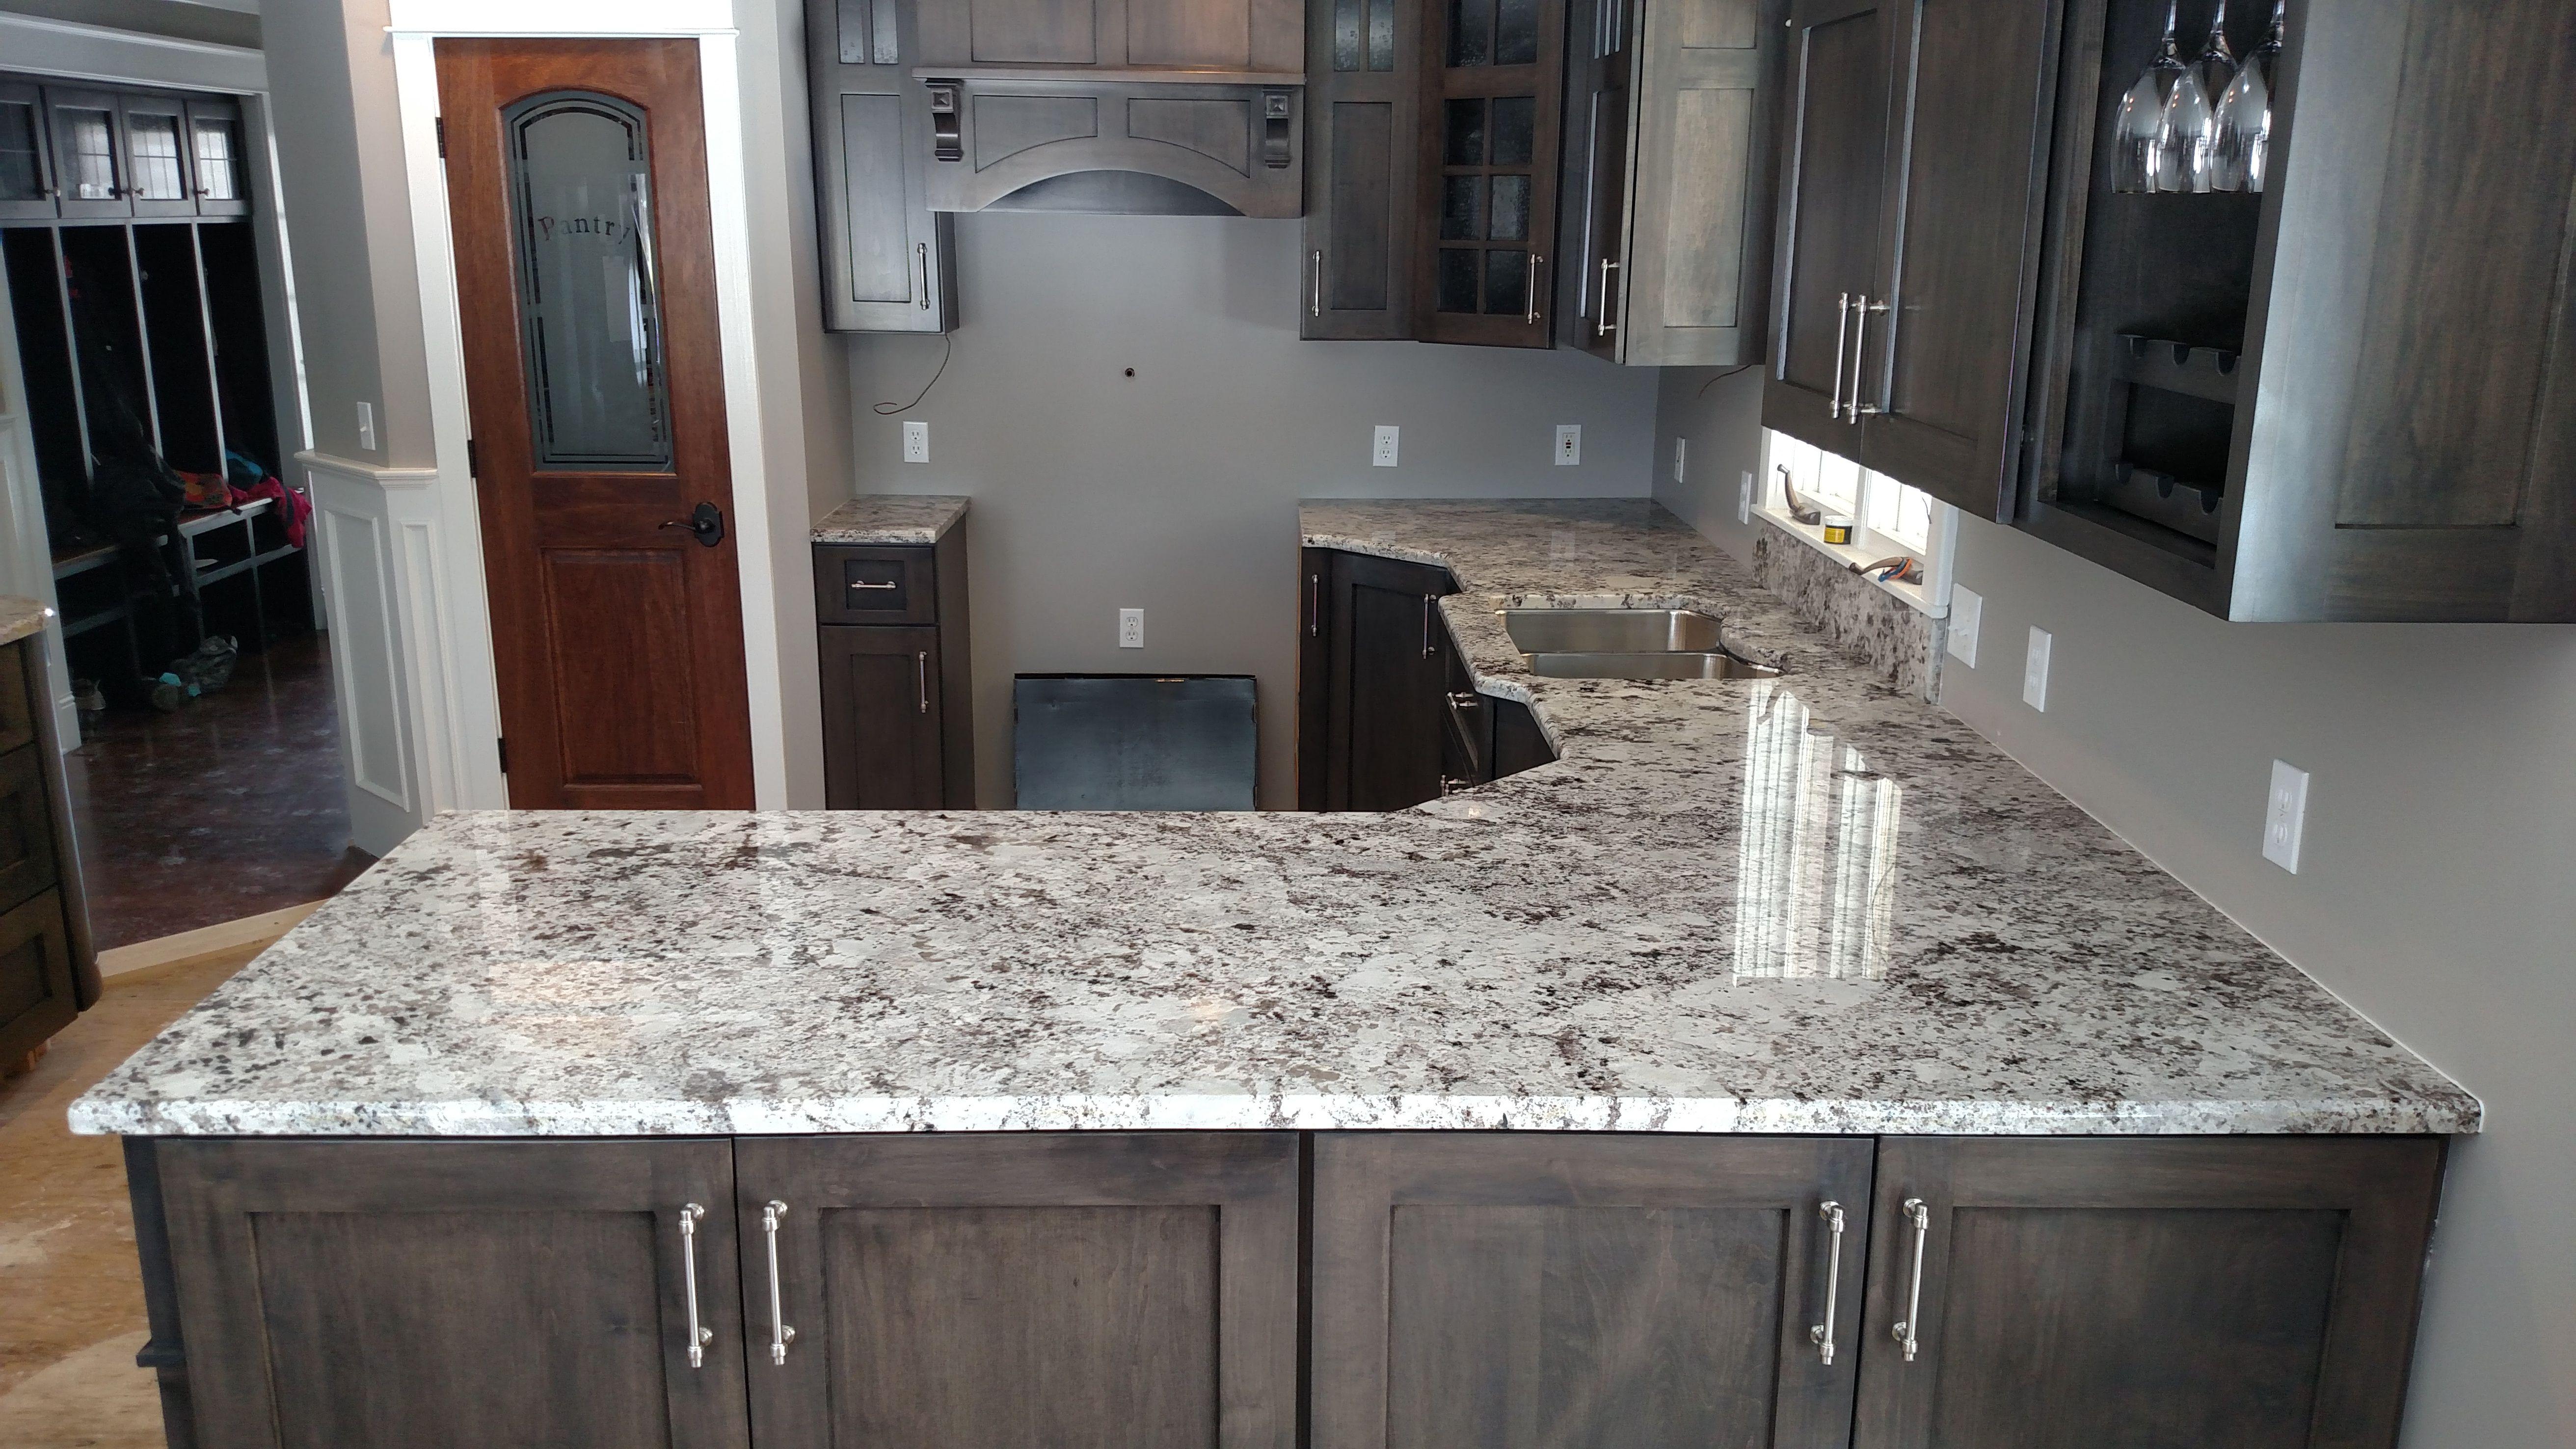 Alaska White Granite Looks Amazing Paired With Espresso Cabinets